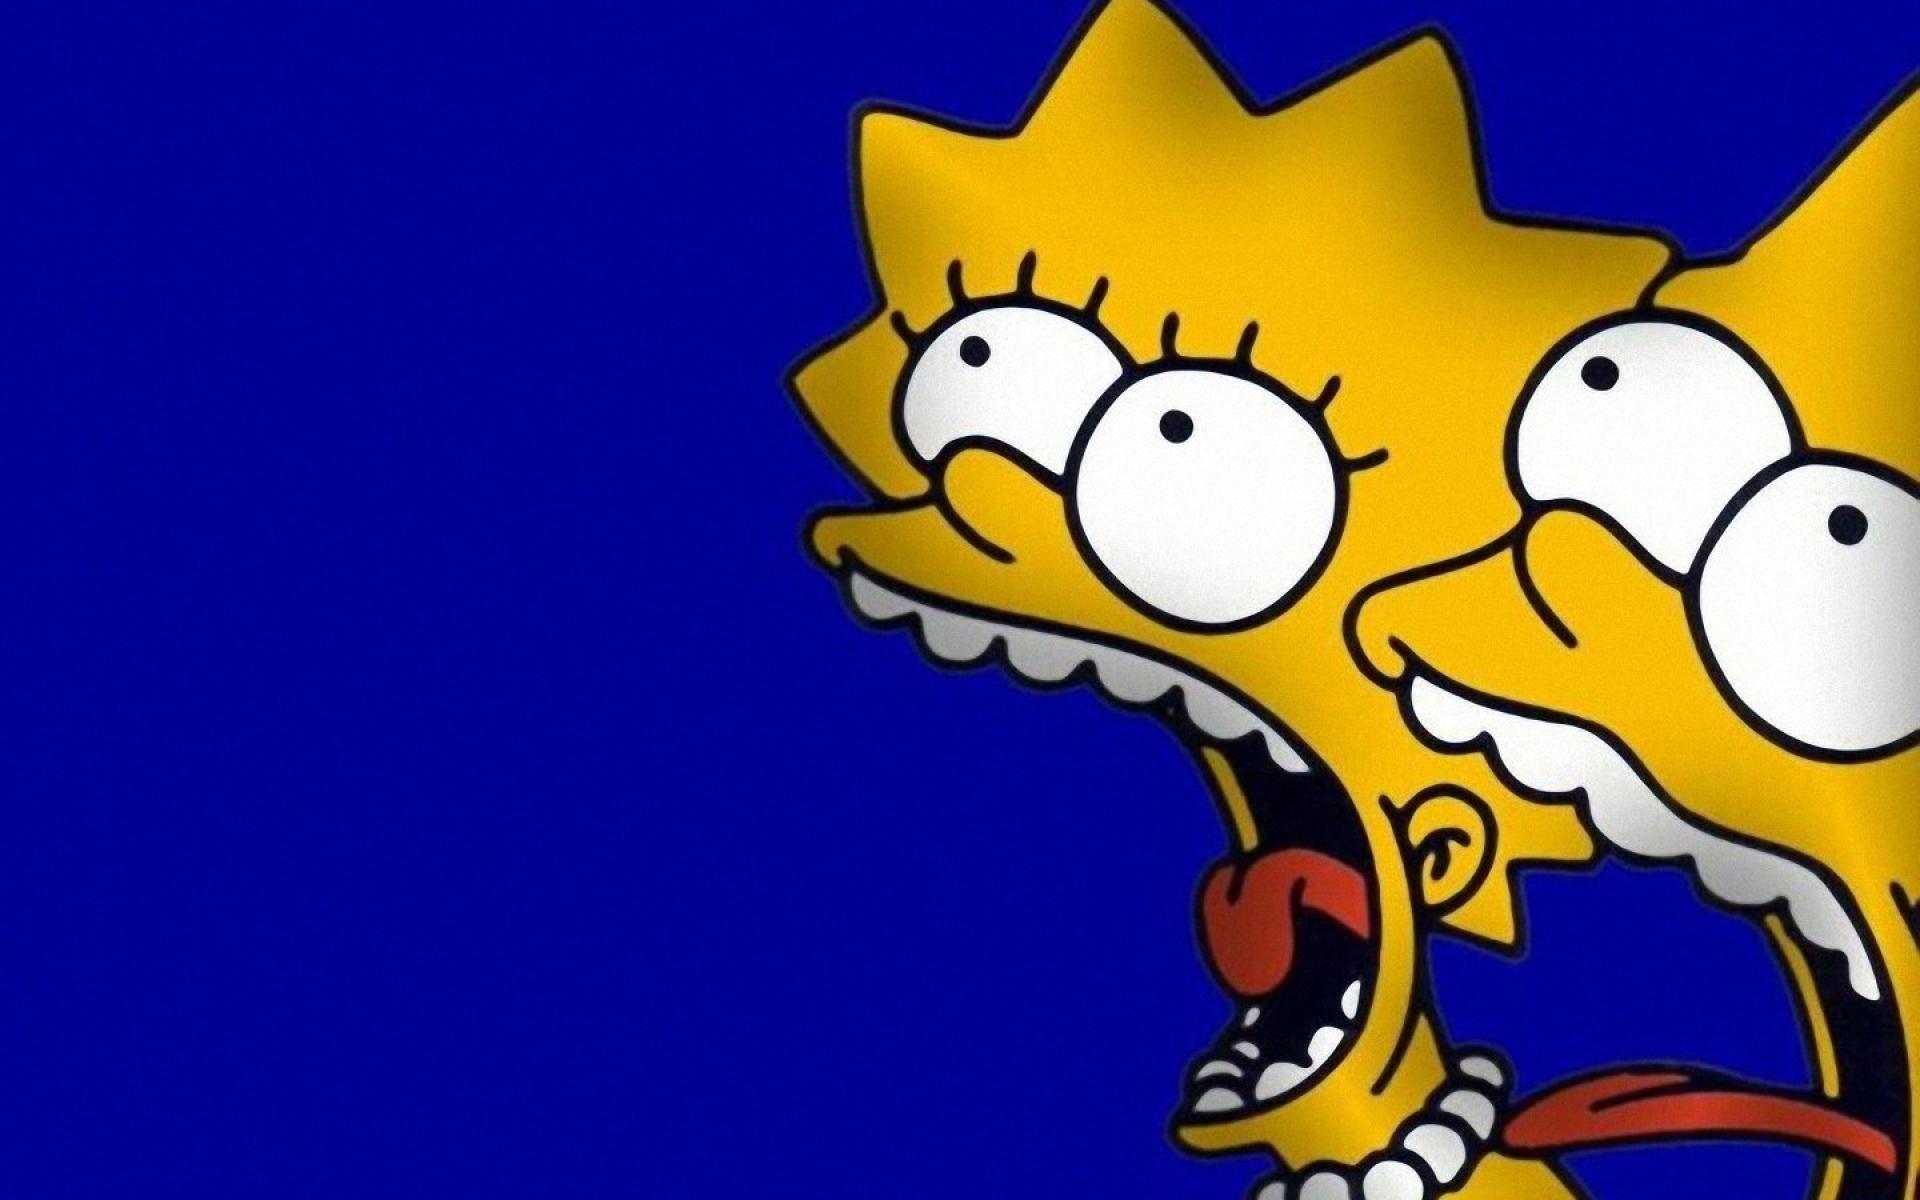 Download Wallpaper Bart Simpson Simpsons Wallpapers 1920x1200